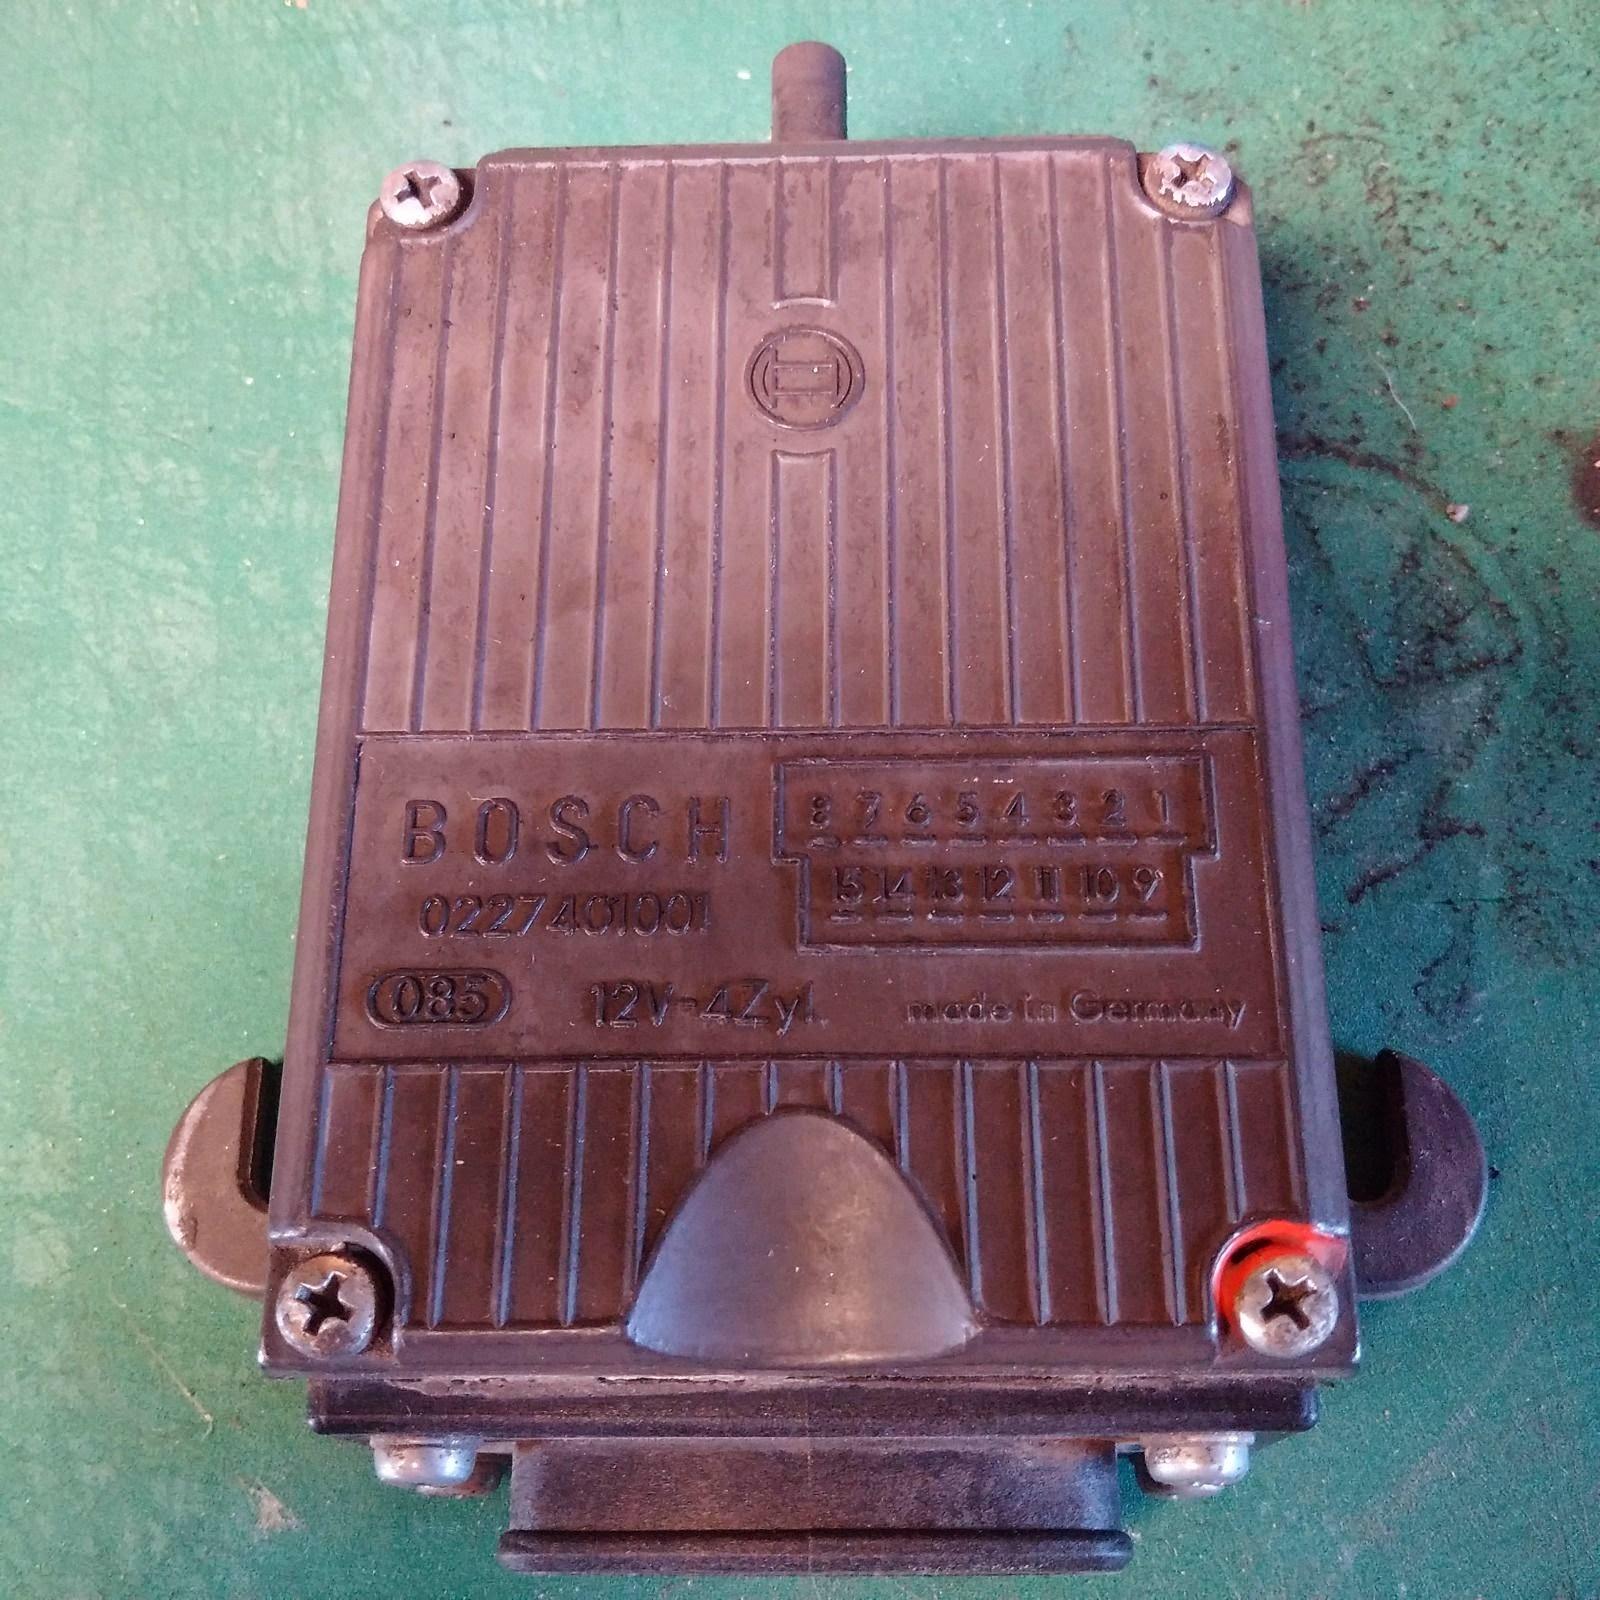 FS: 1985 K100RT Bosch Ignition Module - Model - 0227401001 %24_57%2B%284%29